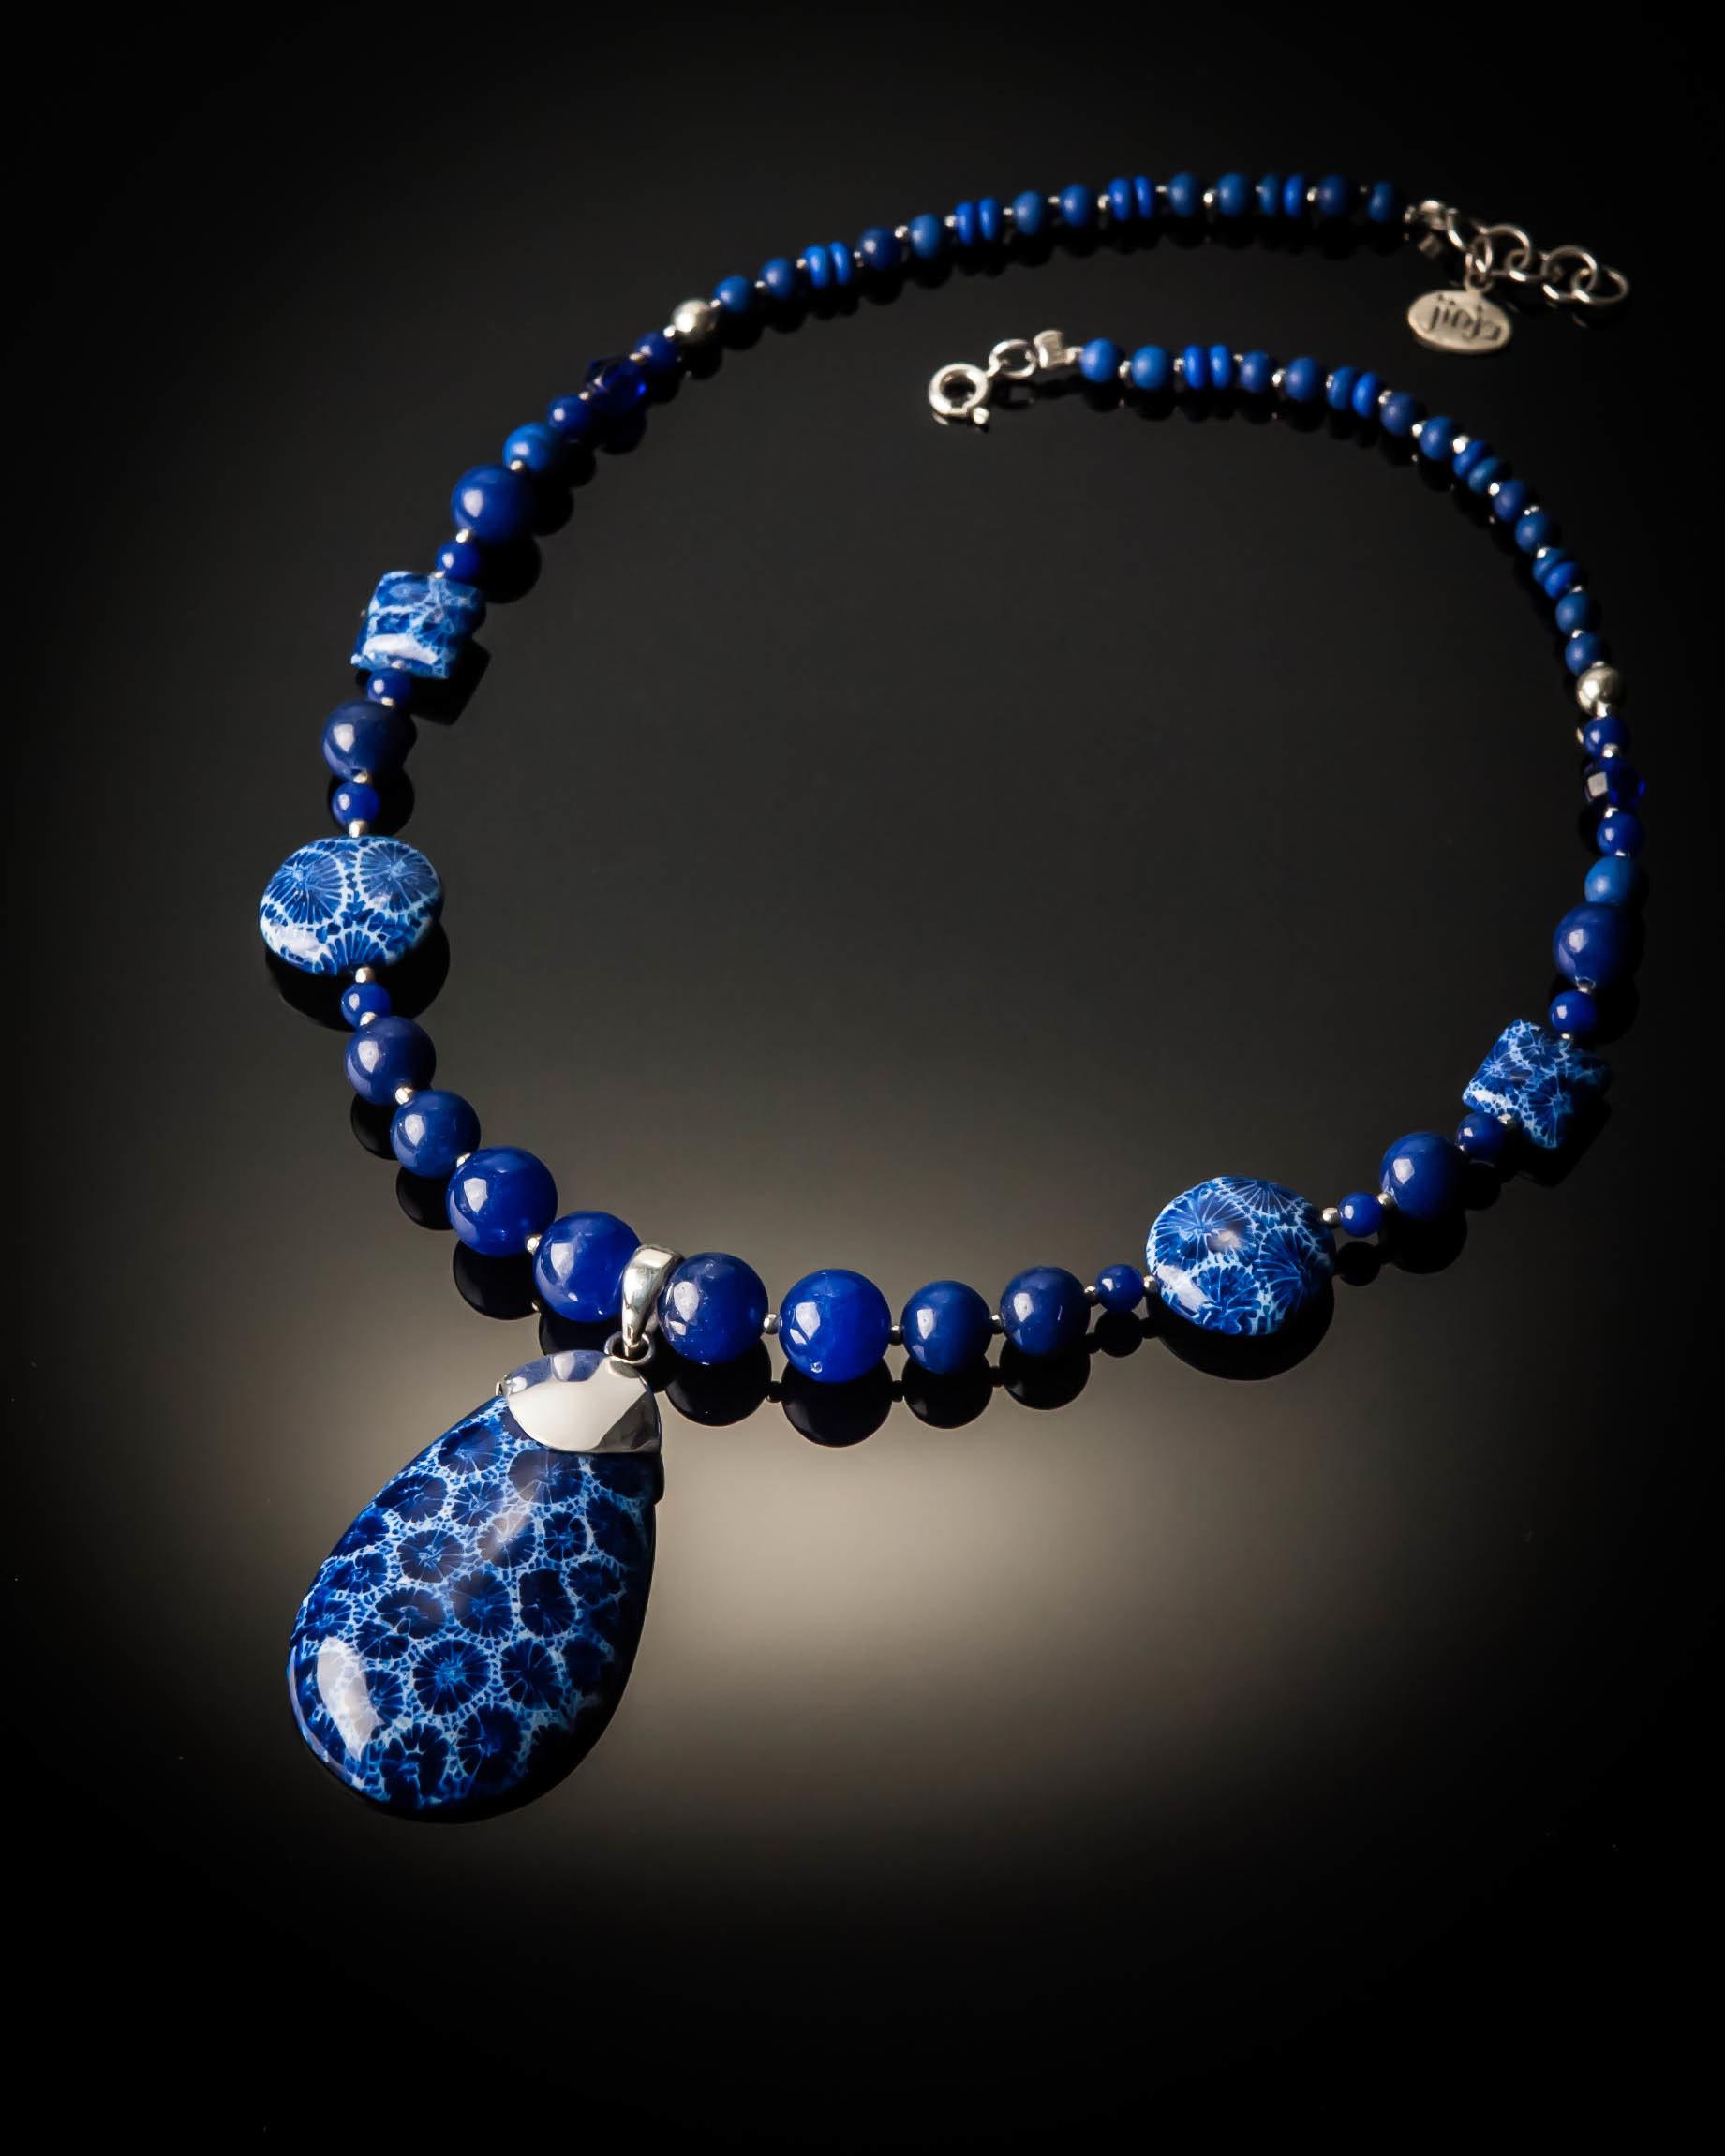 Blue Coral Pendant Bead Necklace 1088